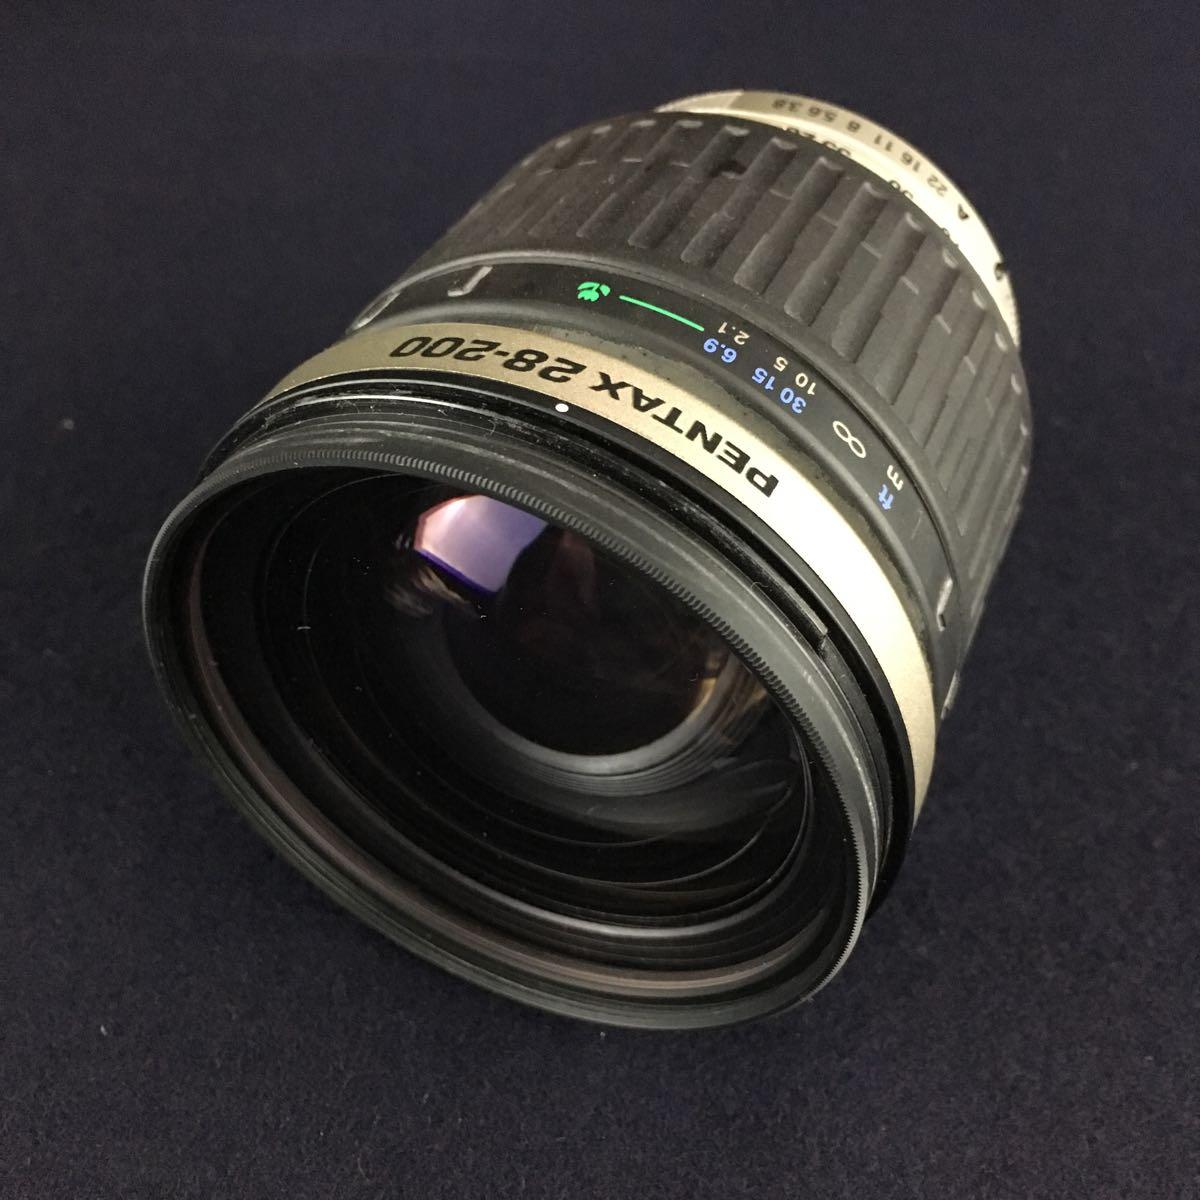 PENTAX-FA 43mm 1.9 Limited / FA 28-200mm 3.8-5.6 オートフォーカスレンズ2点_画像2